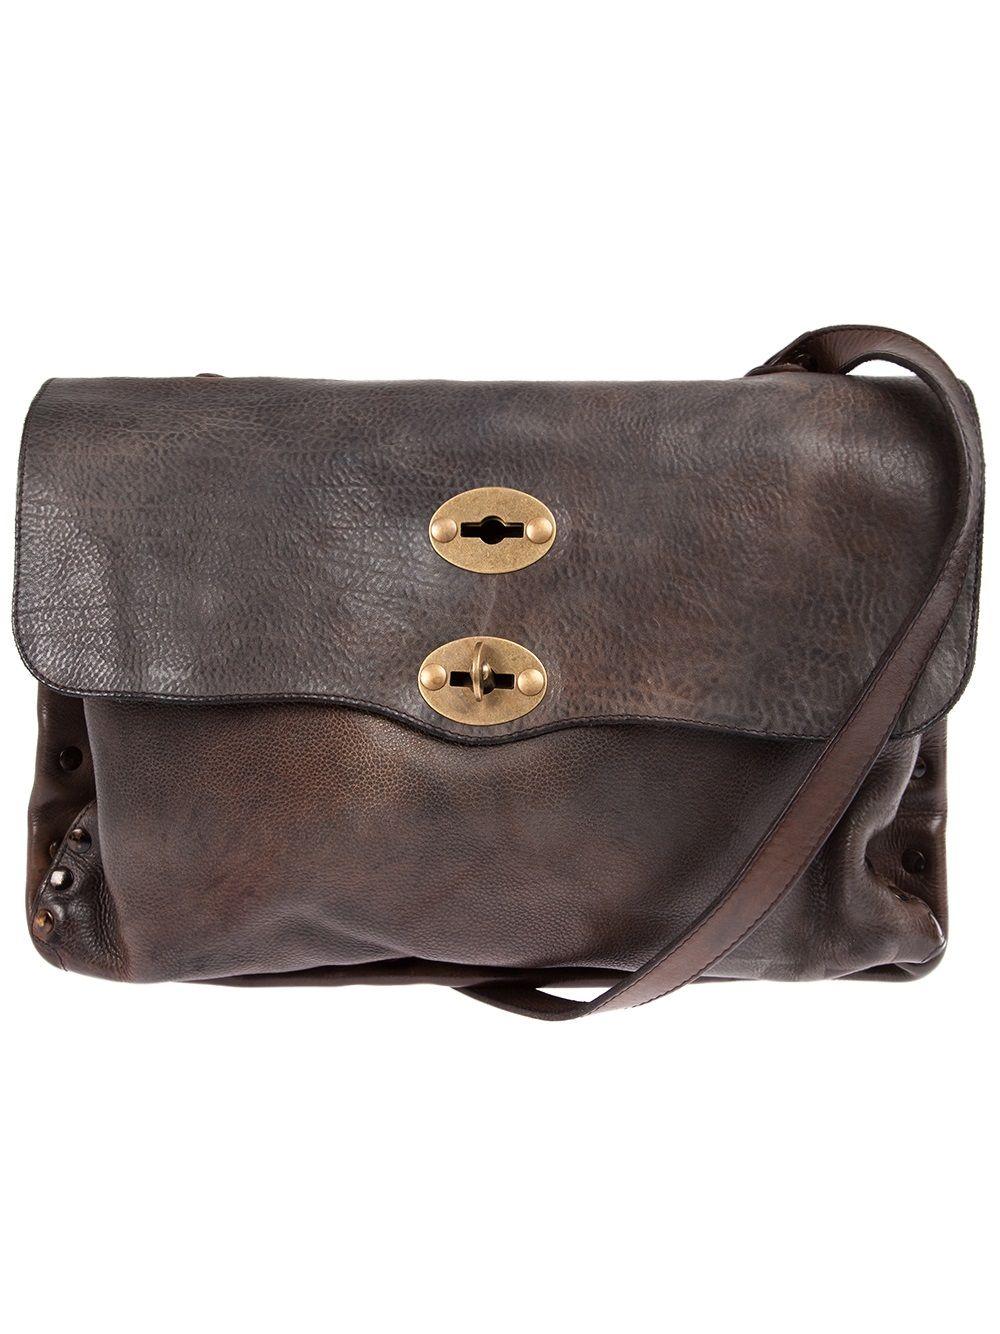 aa6c4acc3e6 ... italy numero 10. mulberry be mine bolsos pinterest bag purse and b015f  78f6e